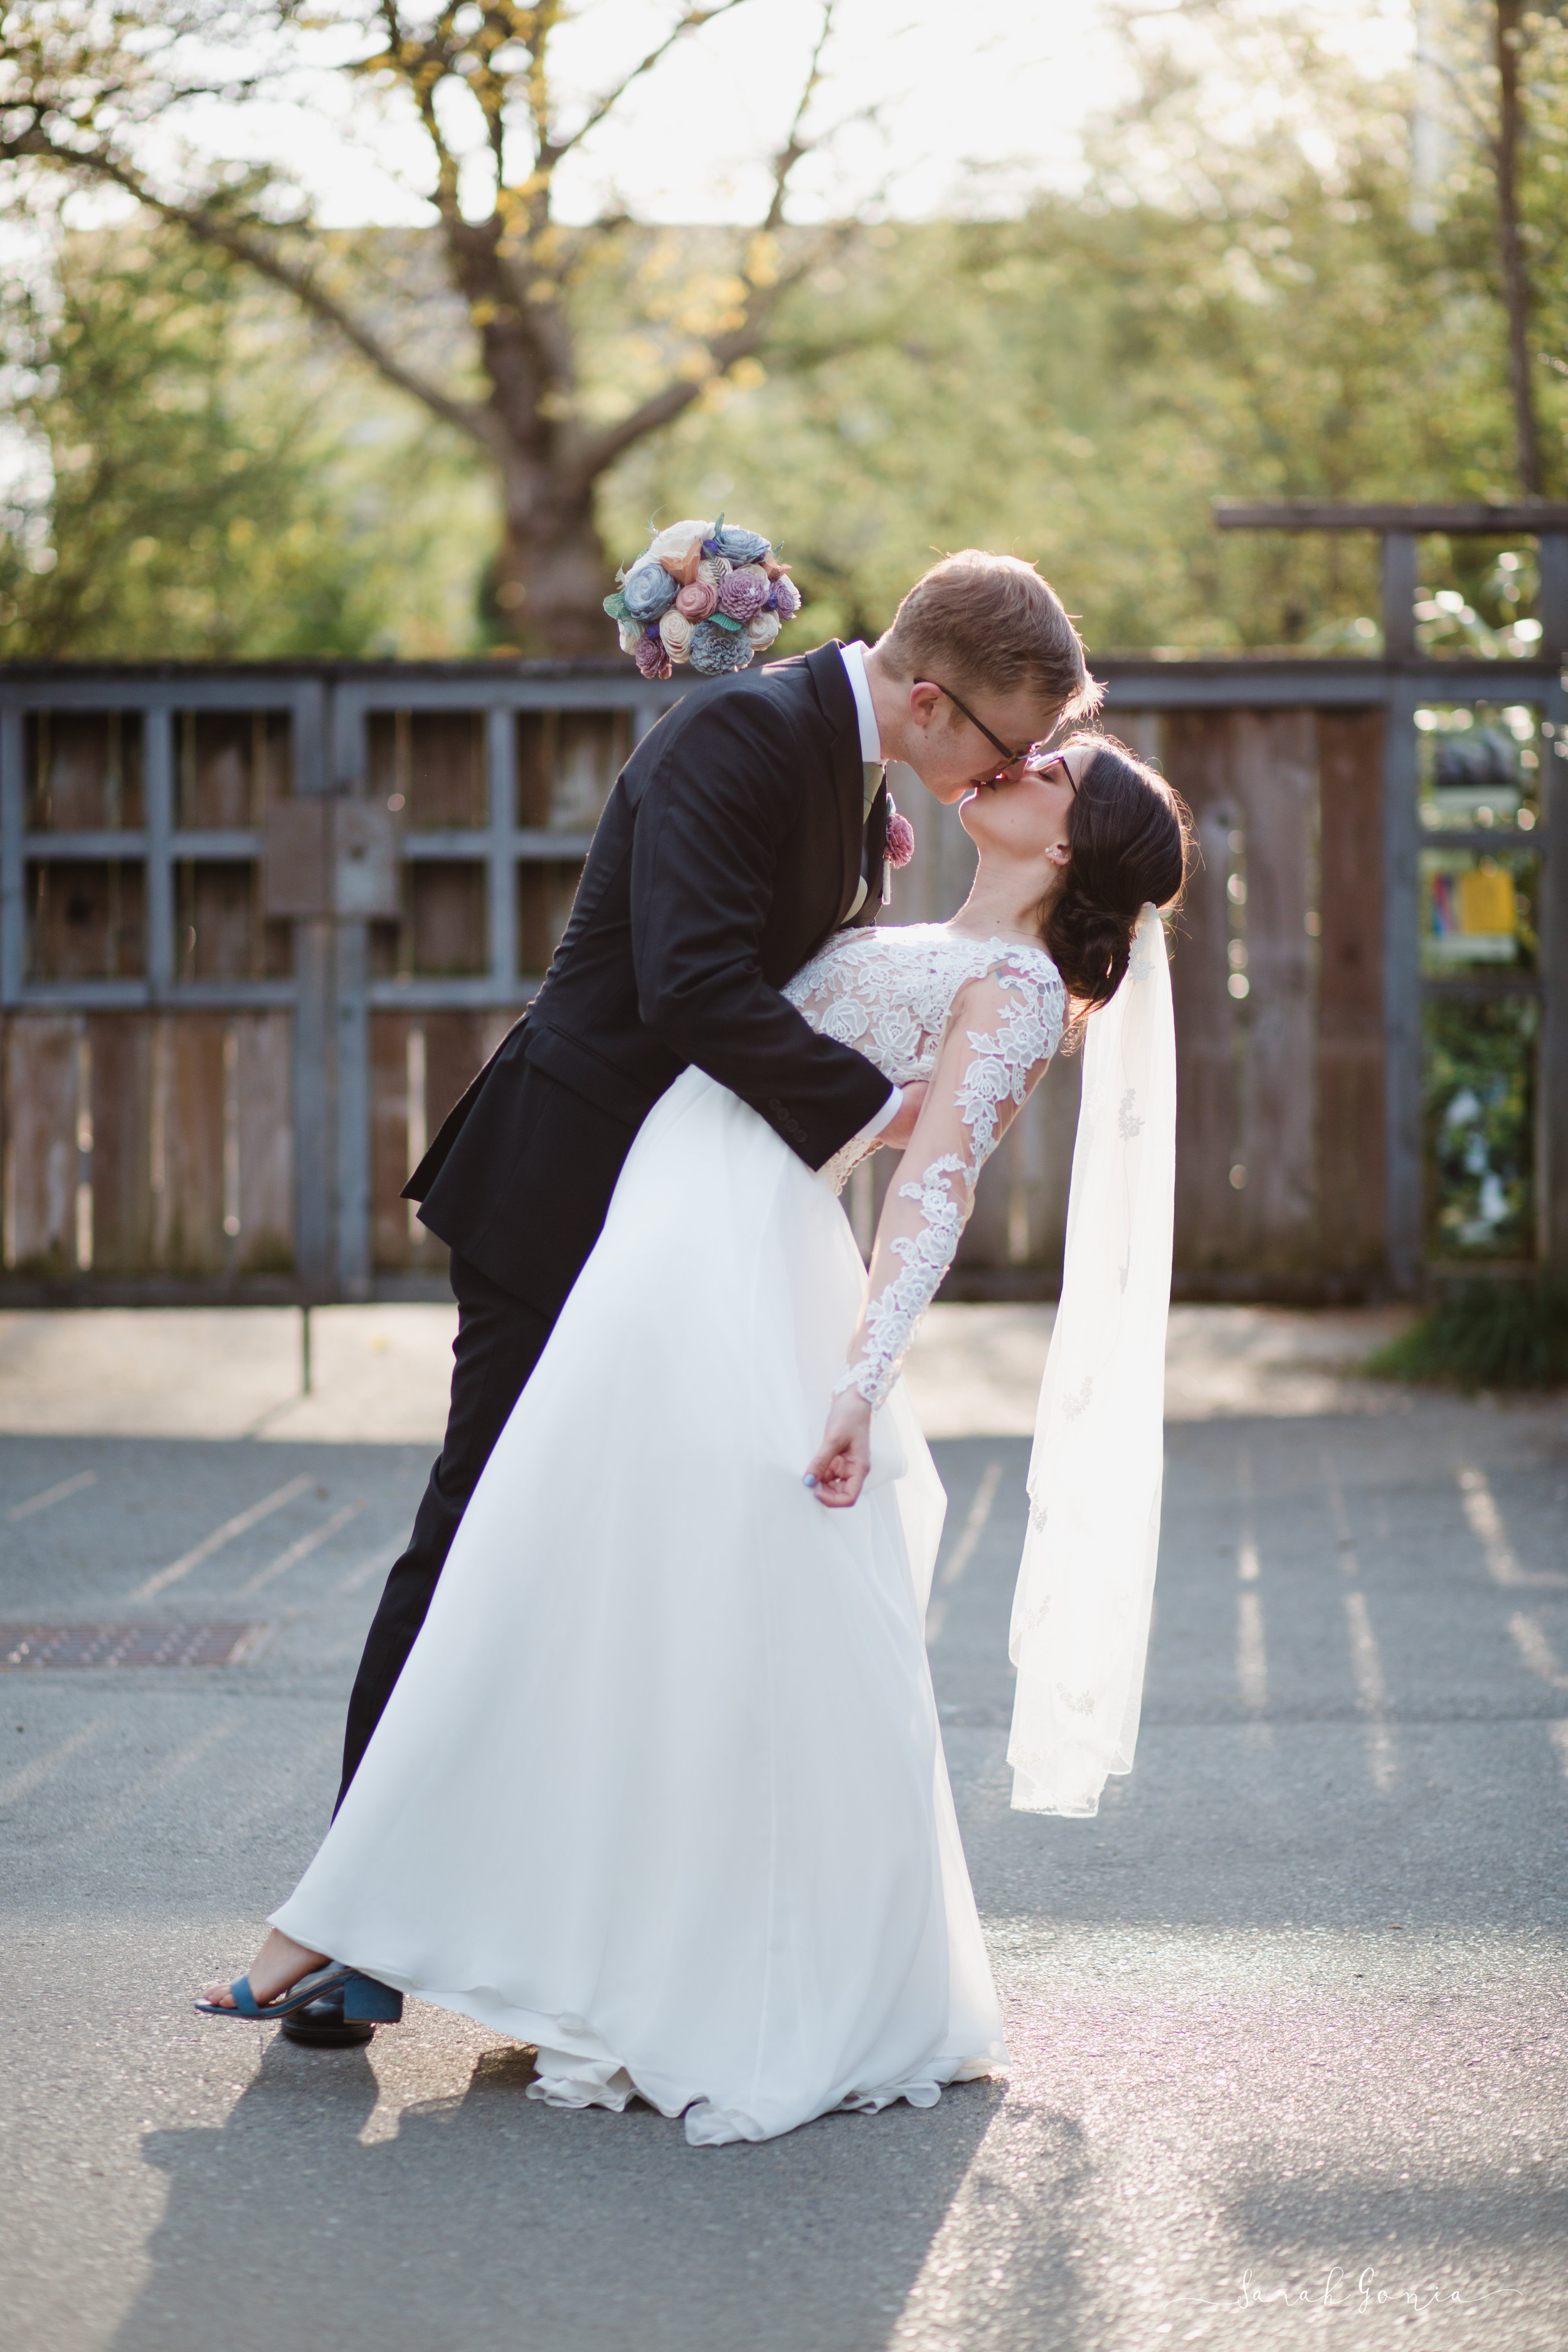 Woodland Park Zoo Wedding Couple | Olympia Wedding Photographer